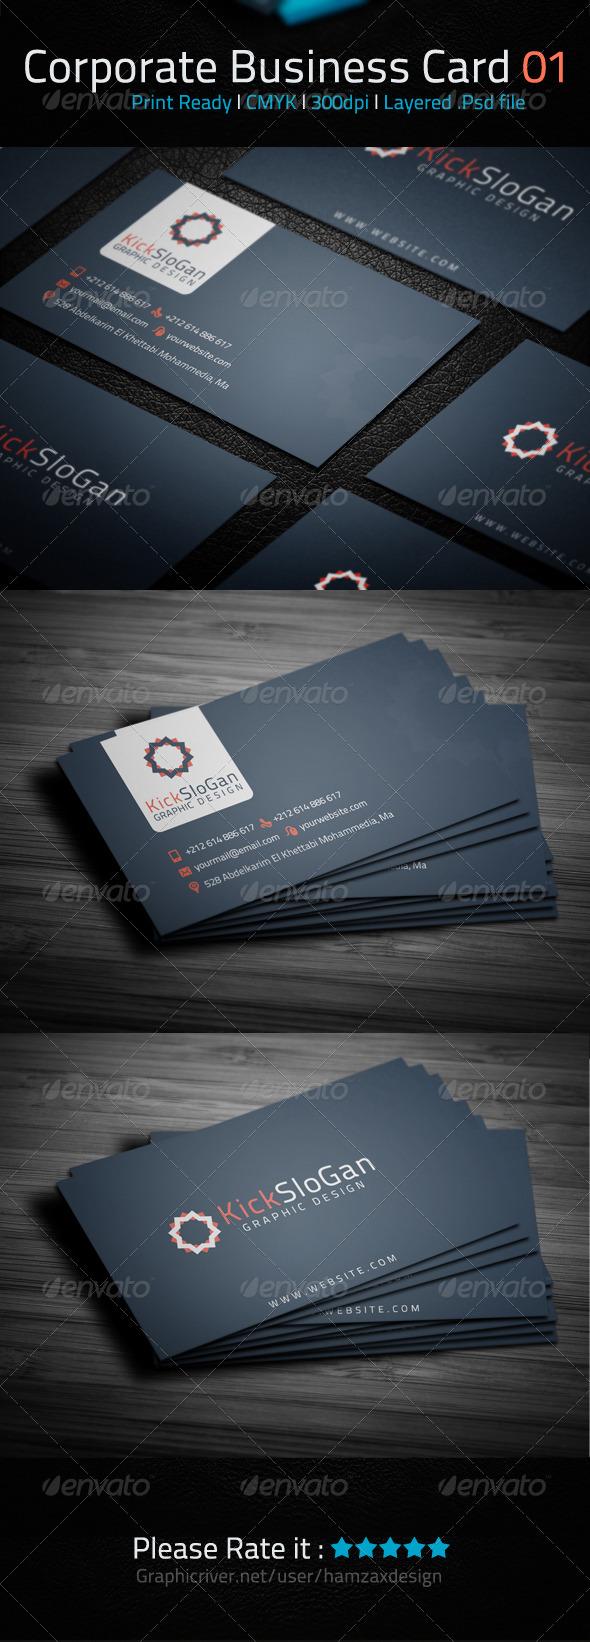 Corporate Business Card 01 - Corporate Business Cards